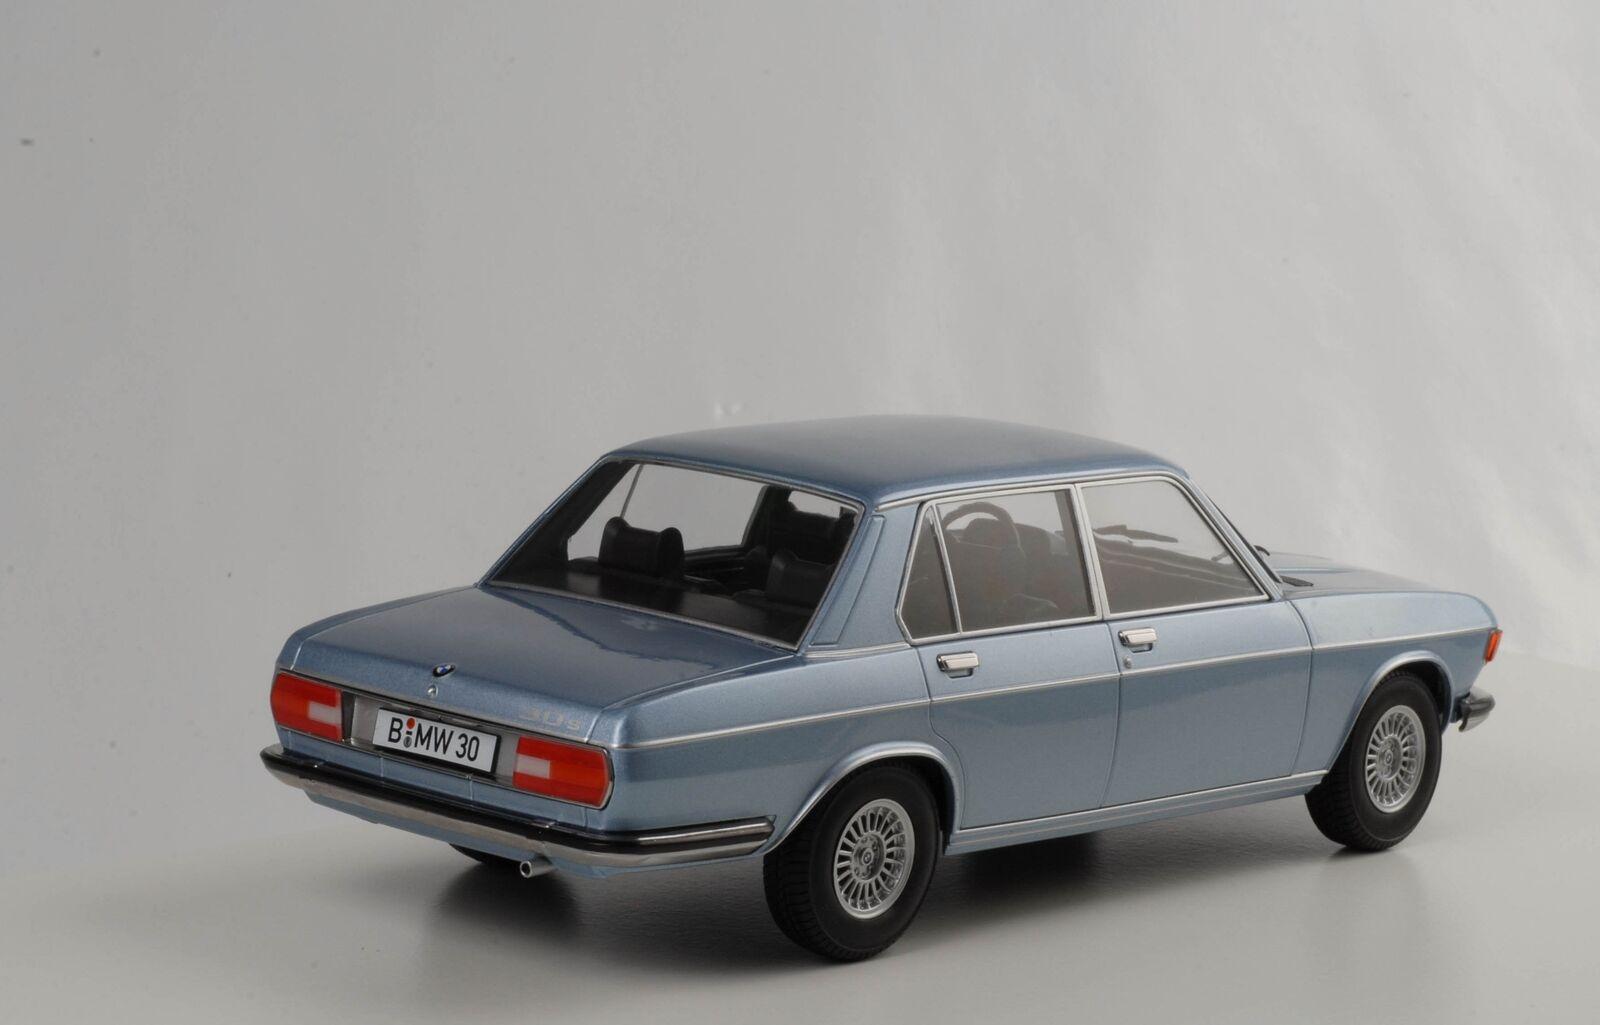 BMW 3.0 S E3 2.Serie 1971 hellblau-metallic diecast 1 18 KK-Scale